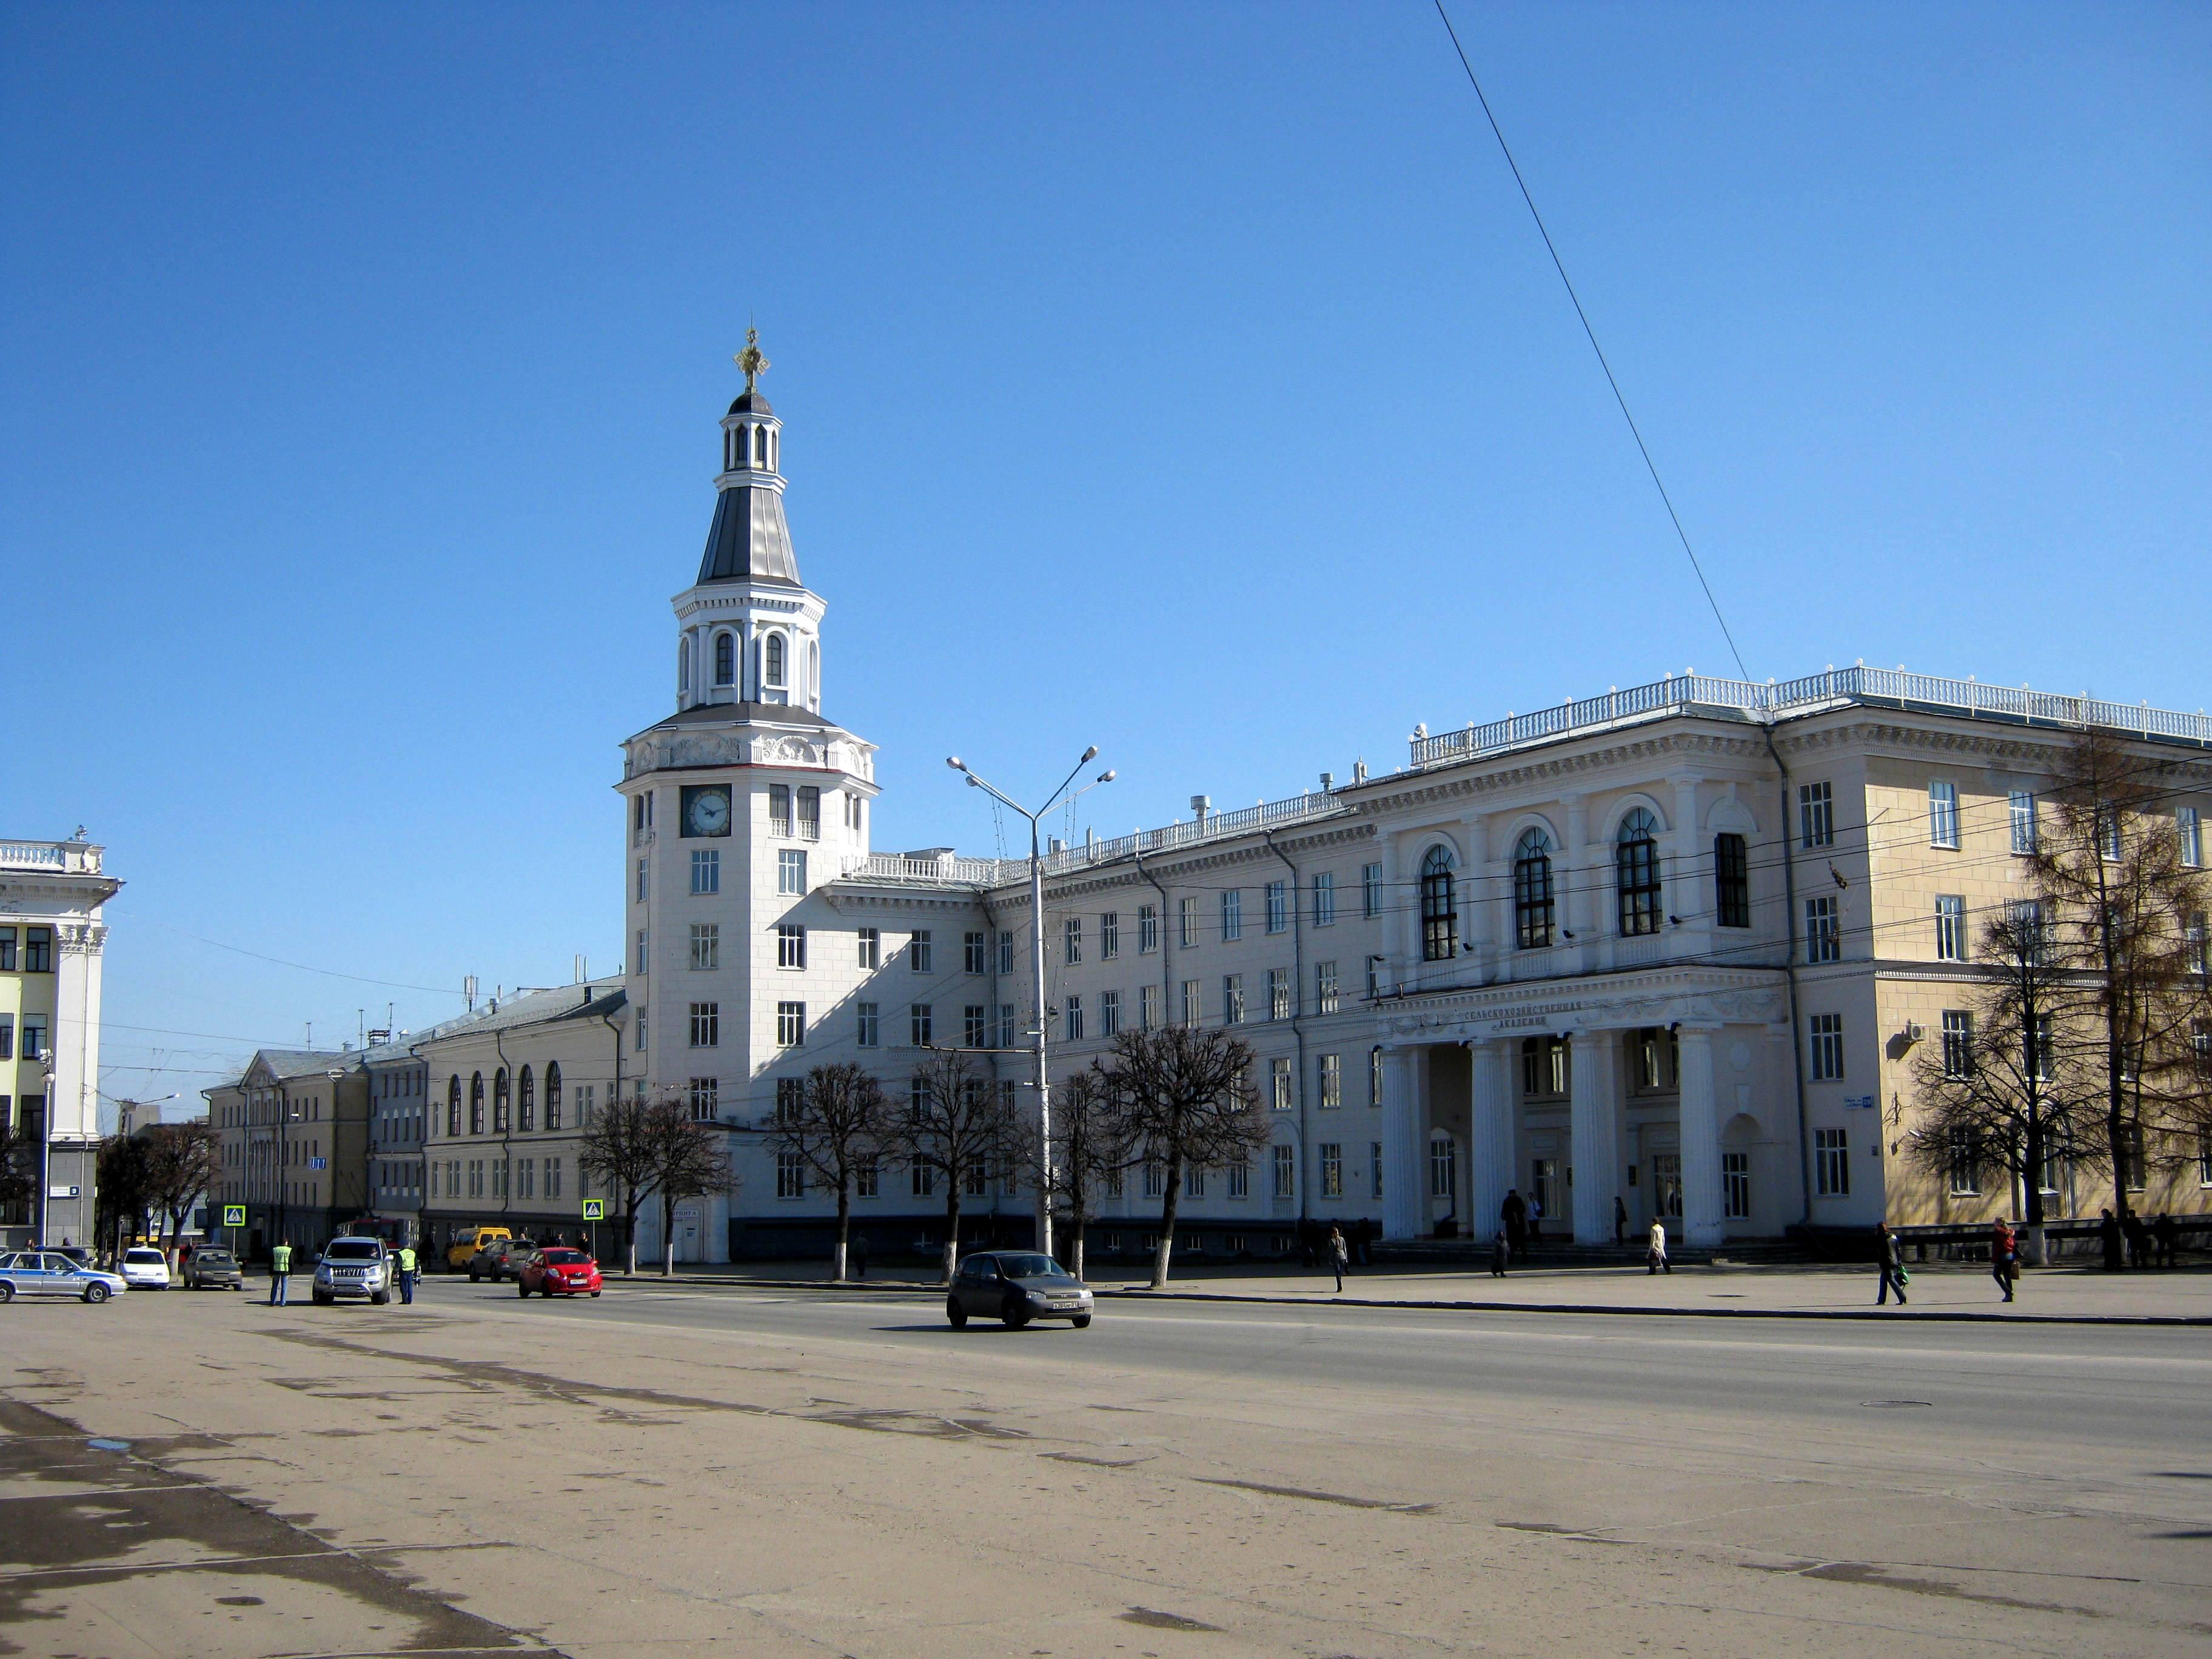 Дарсонваль Улица Низами Чебоксары Диспорт Улица Кочетова Чебоксары